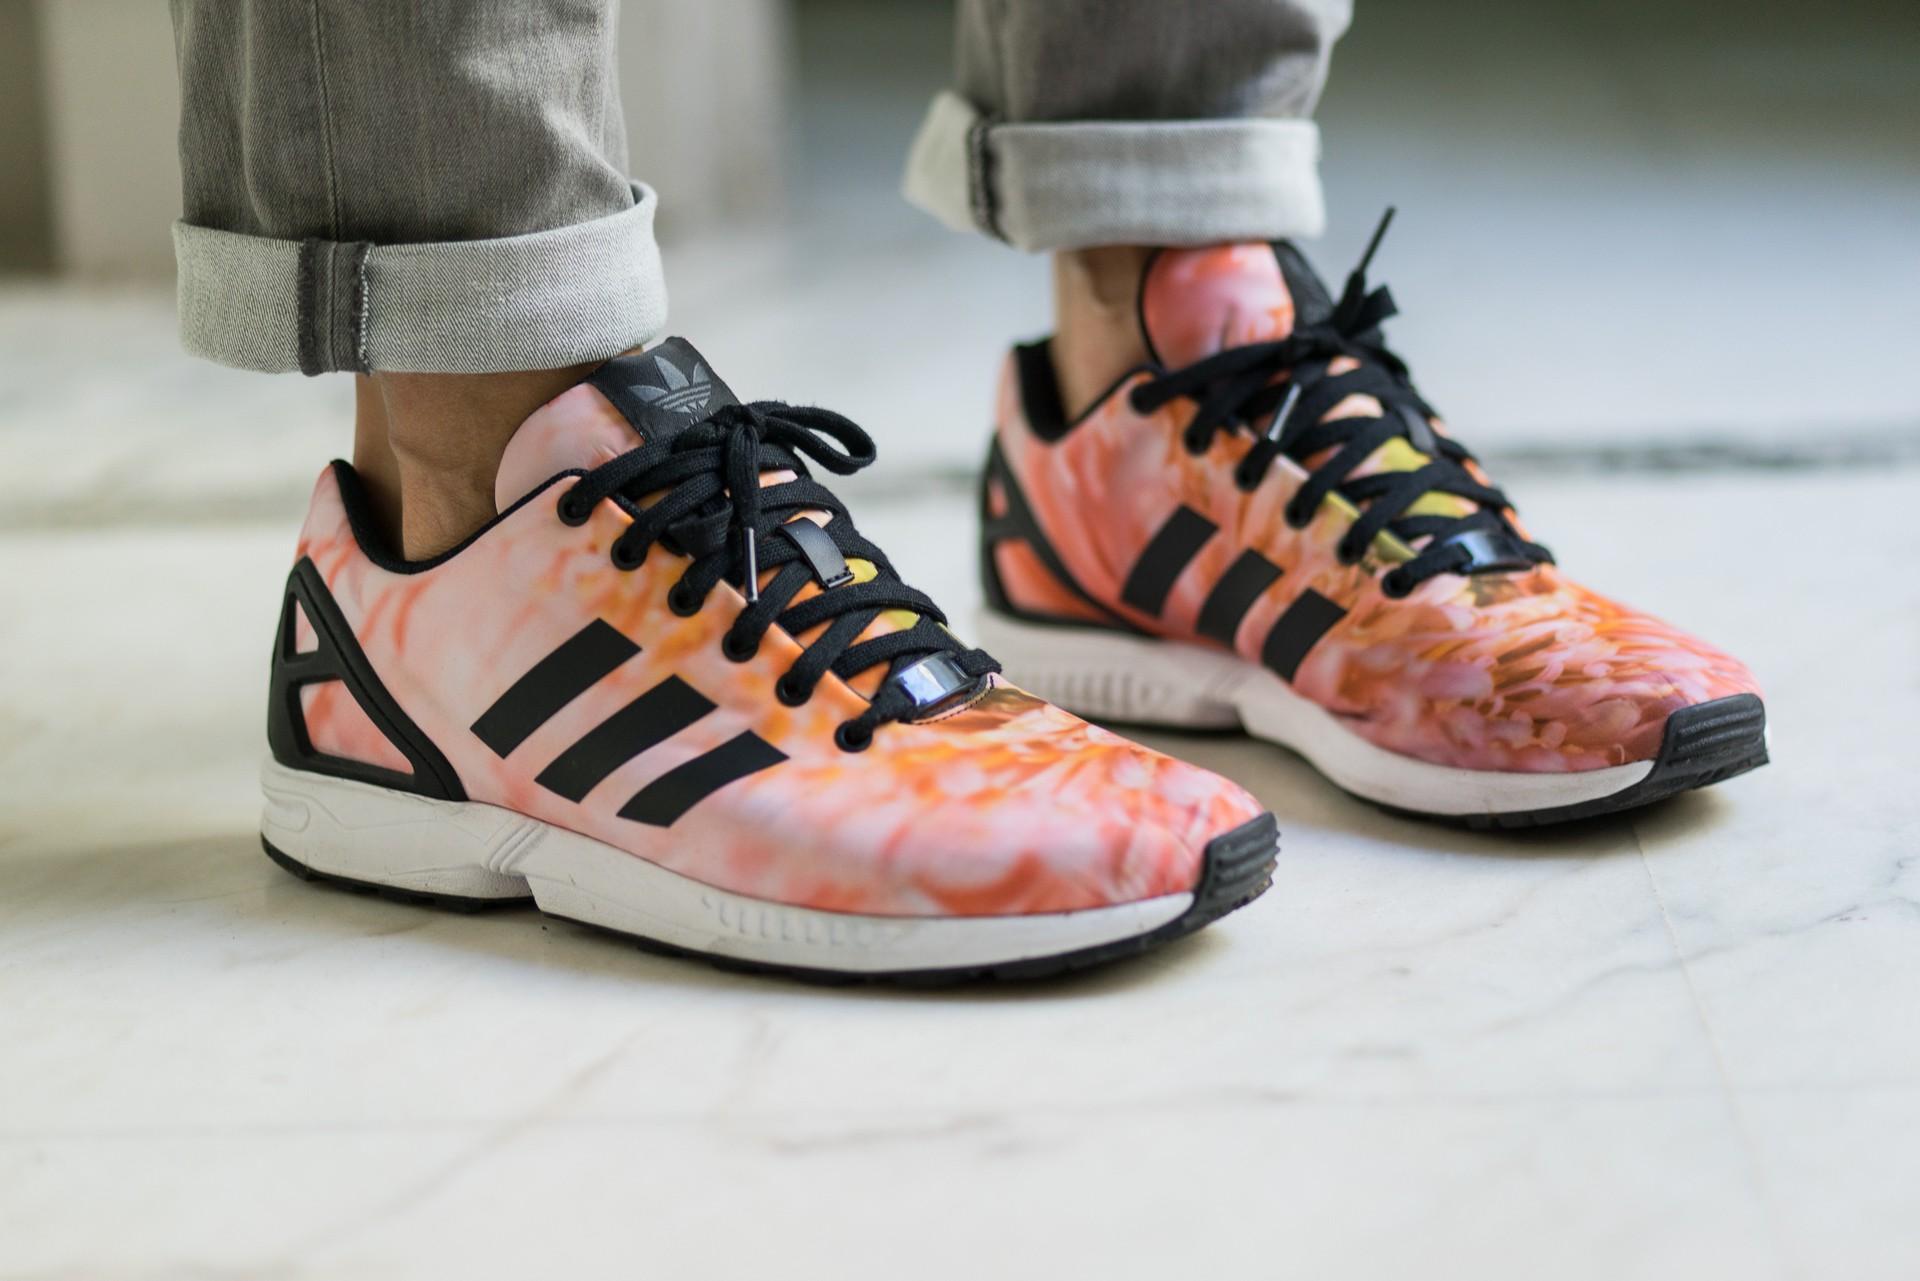 Acheter Chaussure Adidas A Fleur Pas Cher